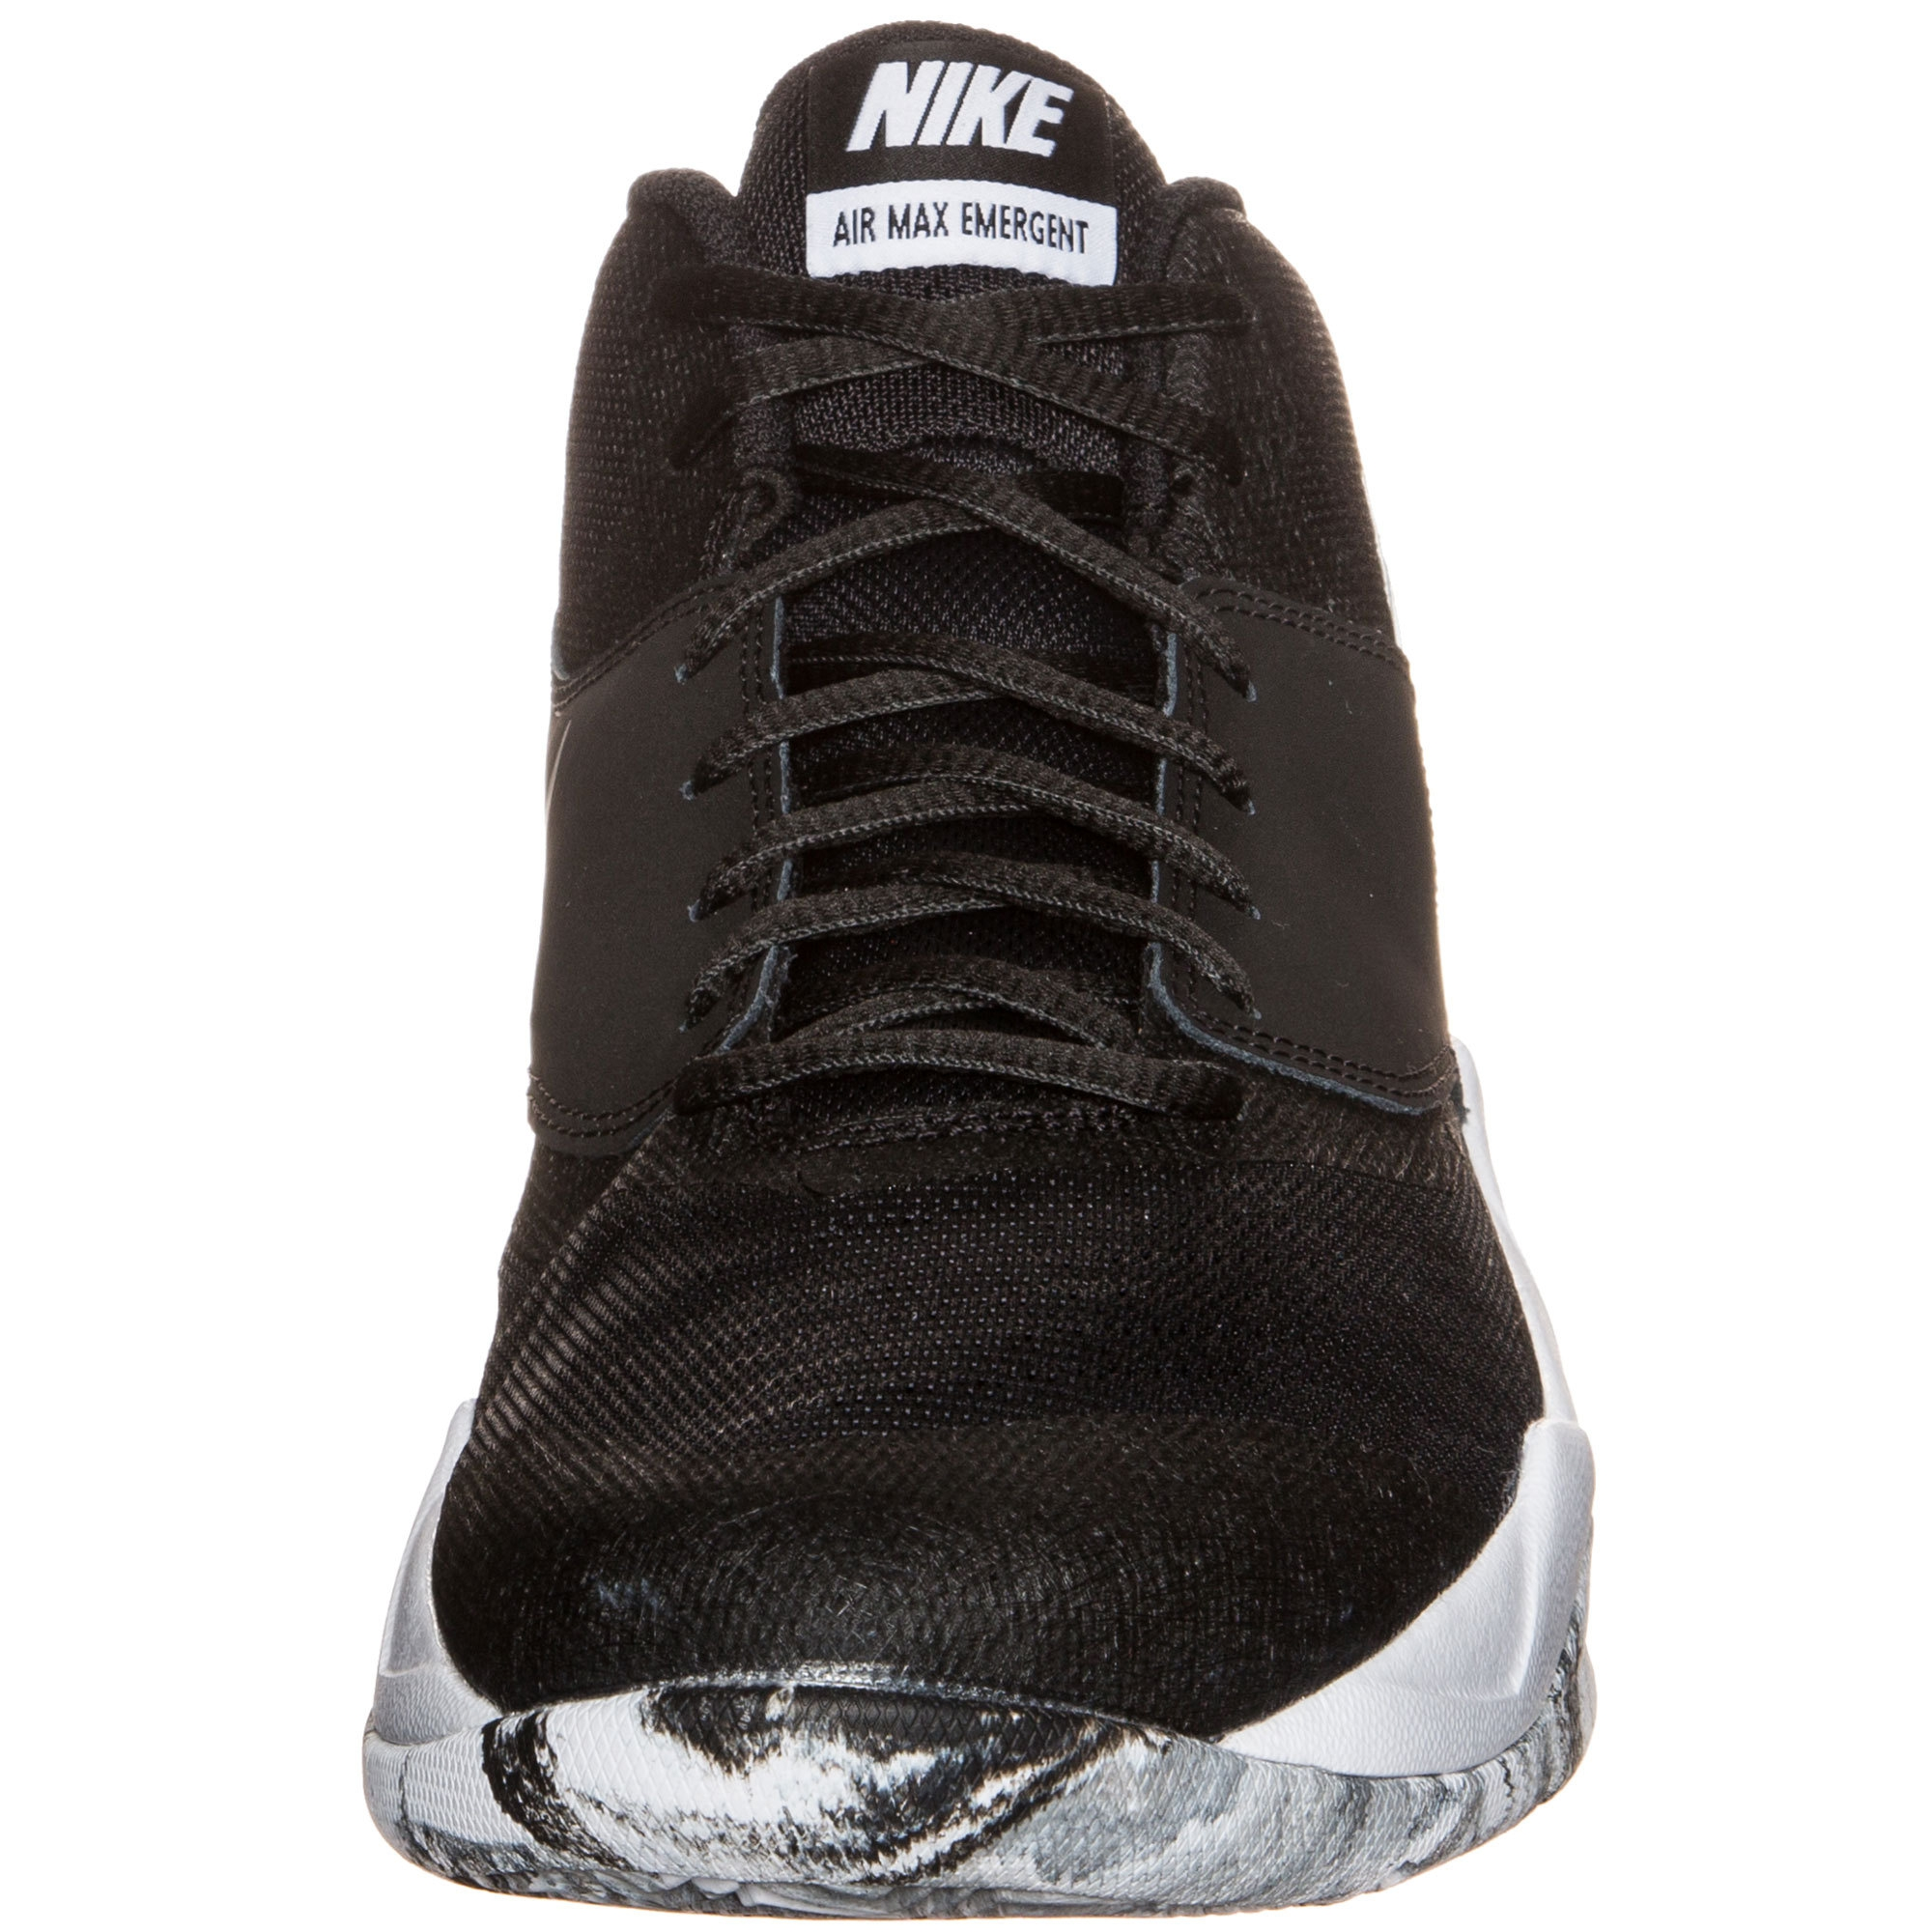 Nike Air Max Emergent Basketballschuh Herren 818954 001 10